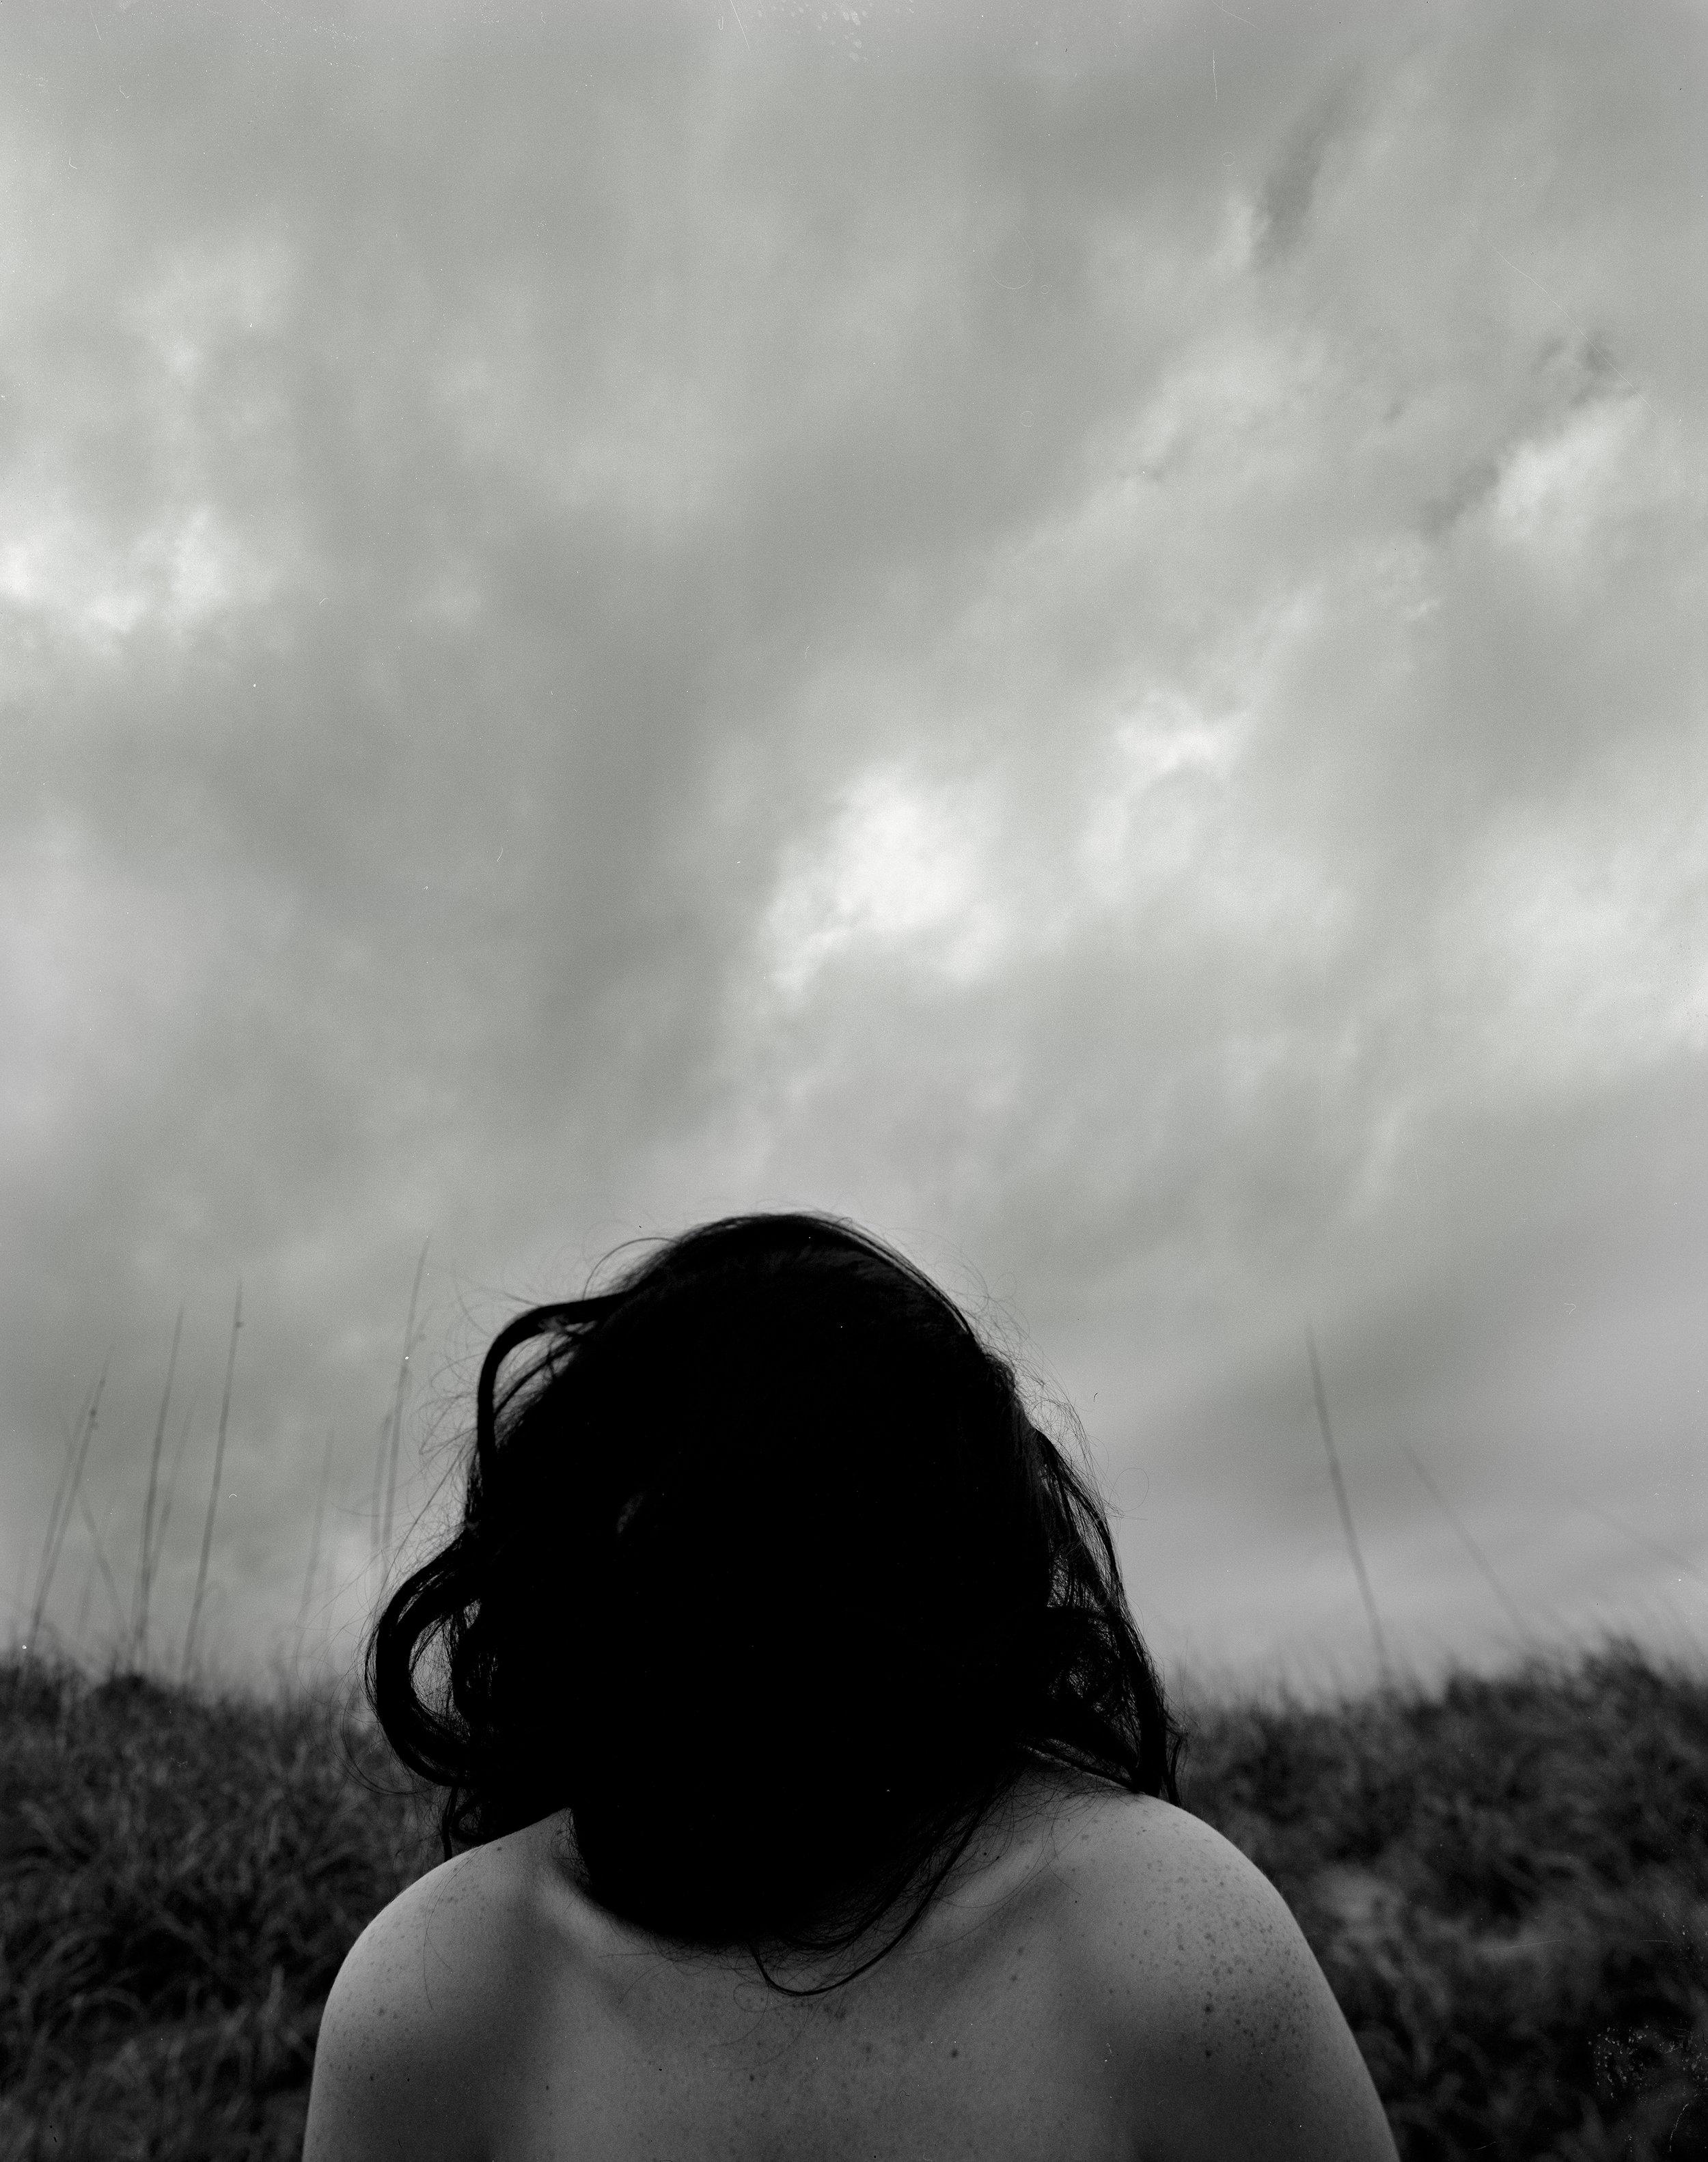 4x5 Film Photograph